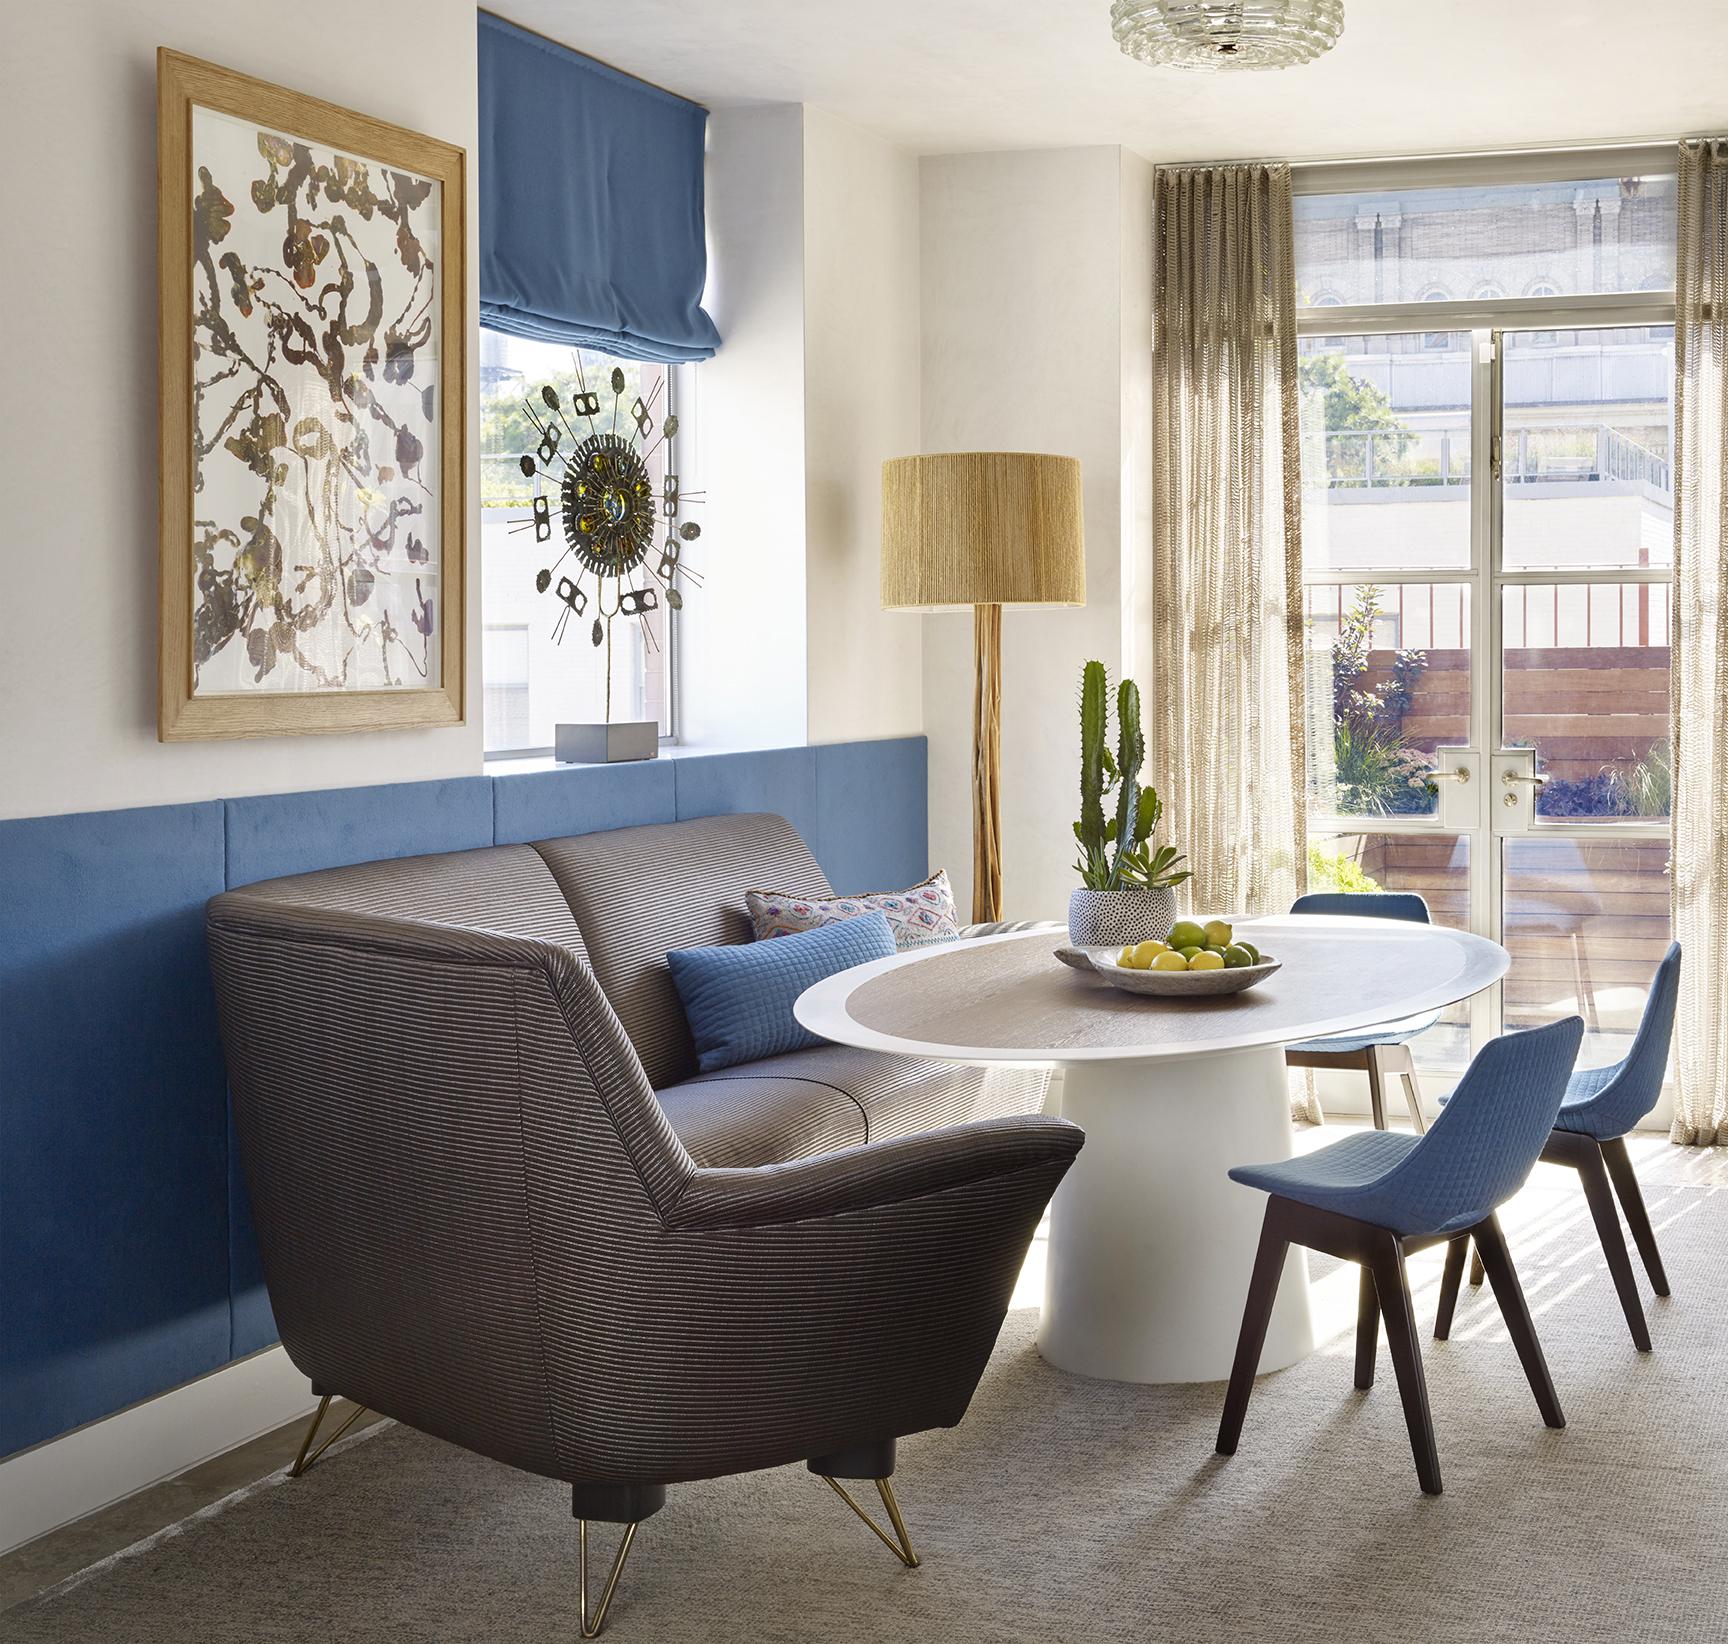 LUXE_121 W21_Breakfast Room_1_photo Peter Murdock.jpg